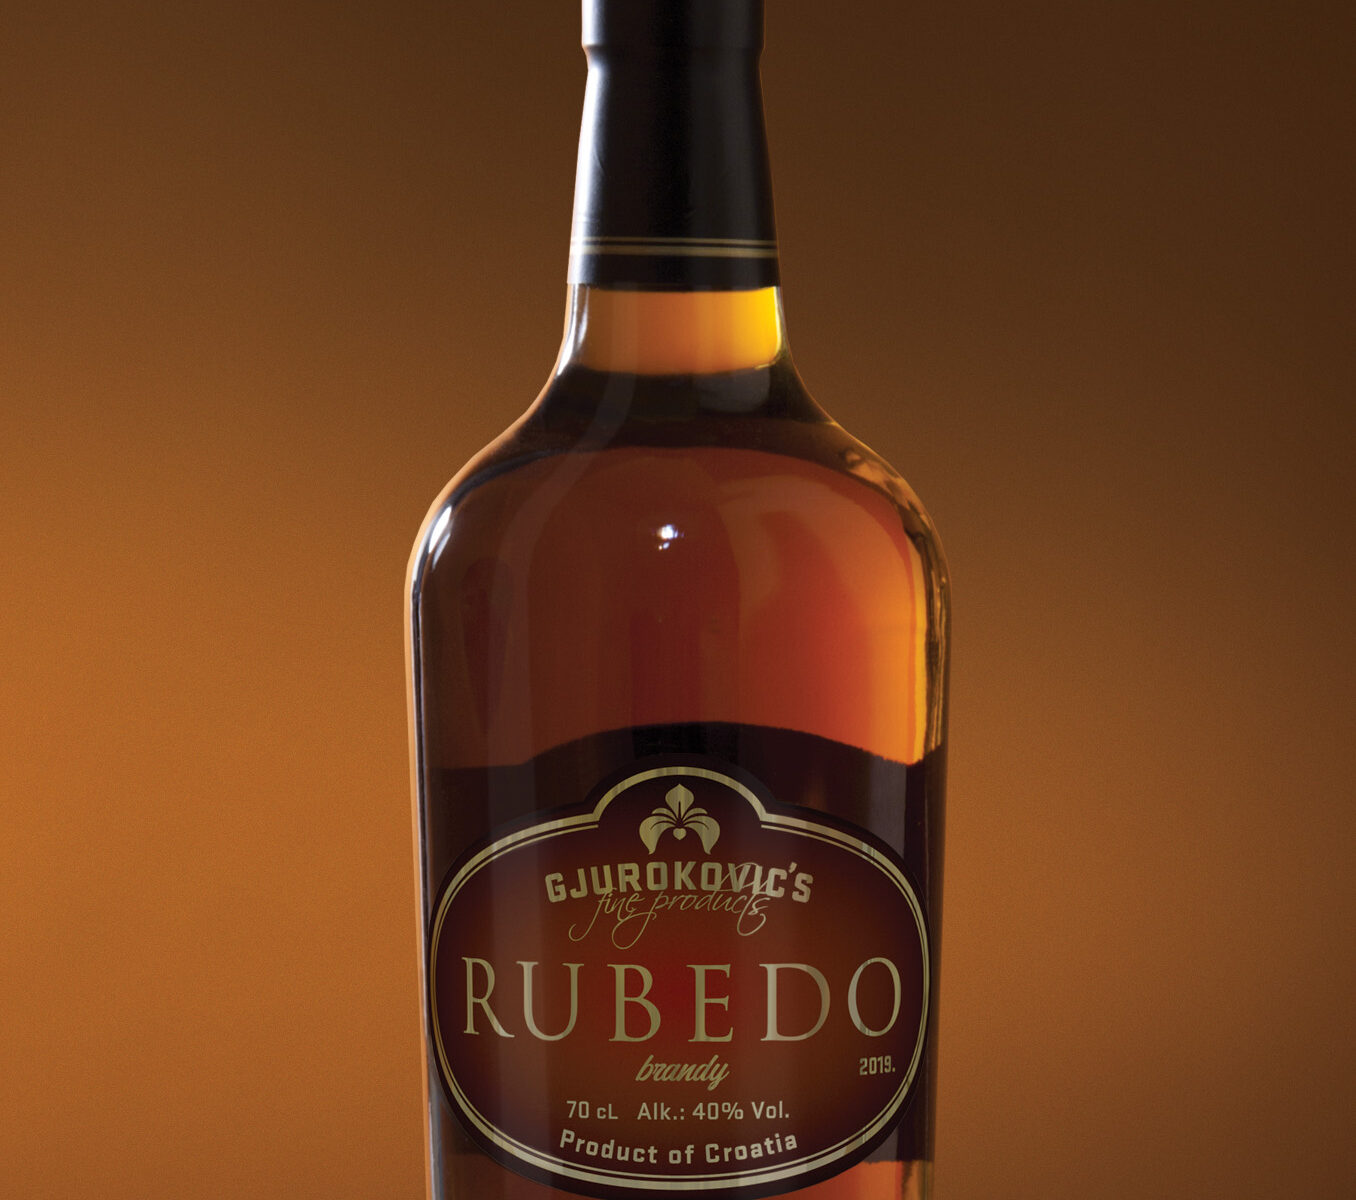 Rubedo brandy